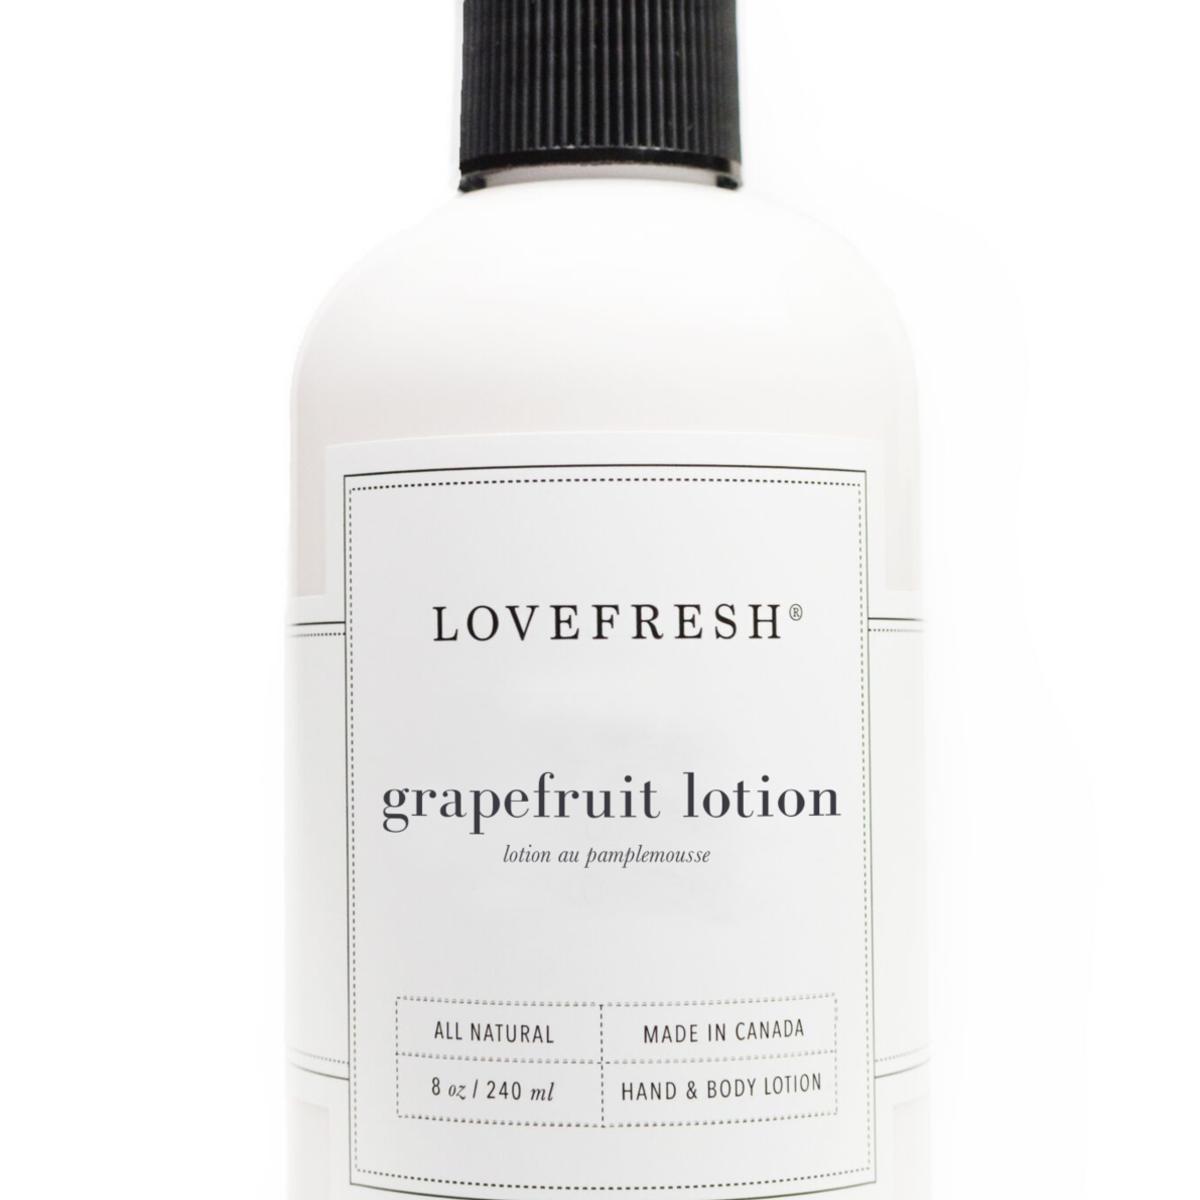 LOVEFRESH LOVEFRESH Hand & Body Lotion, Grapefruit